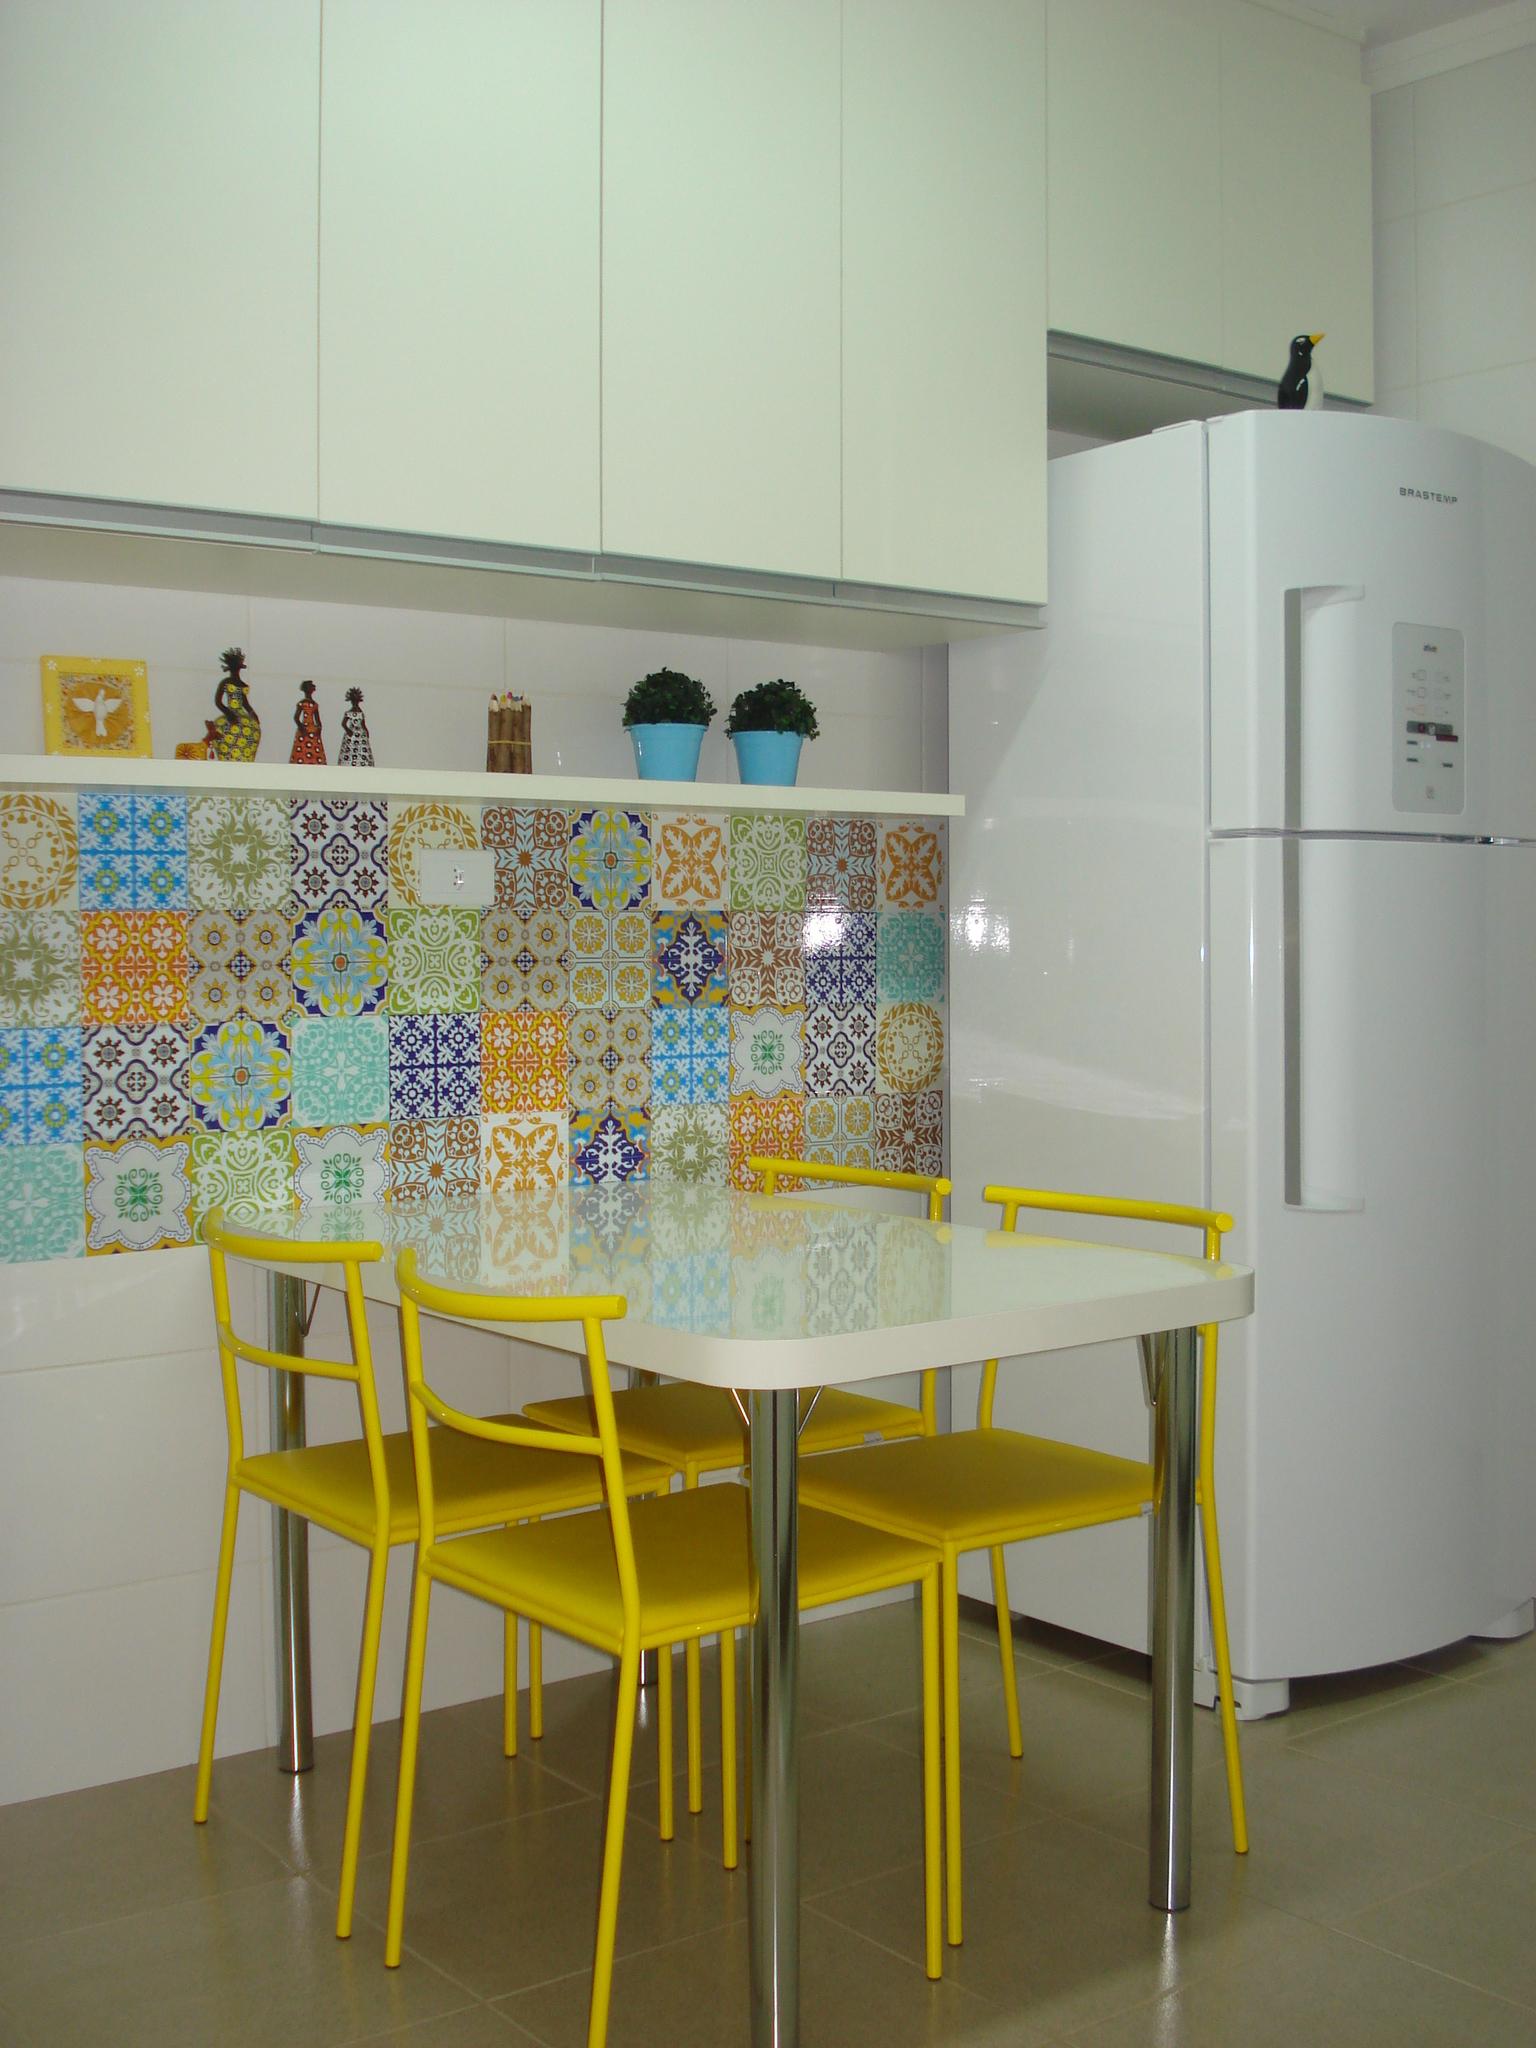 Rà ³tulo Adesivo Floral Produto Artesanal 10 Un Pictures to pin  #C6B404 1536x2048 Banheiro Com Azulejo Antigo